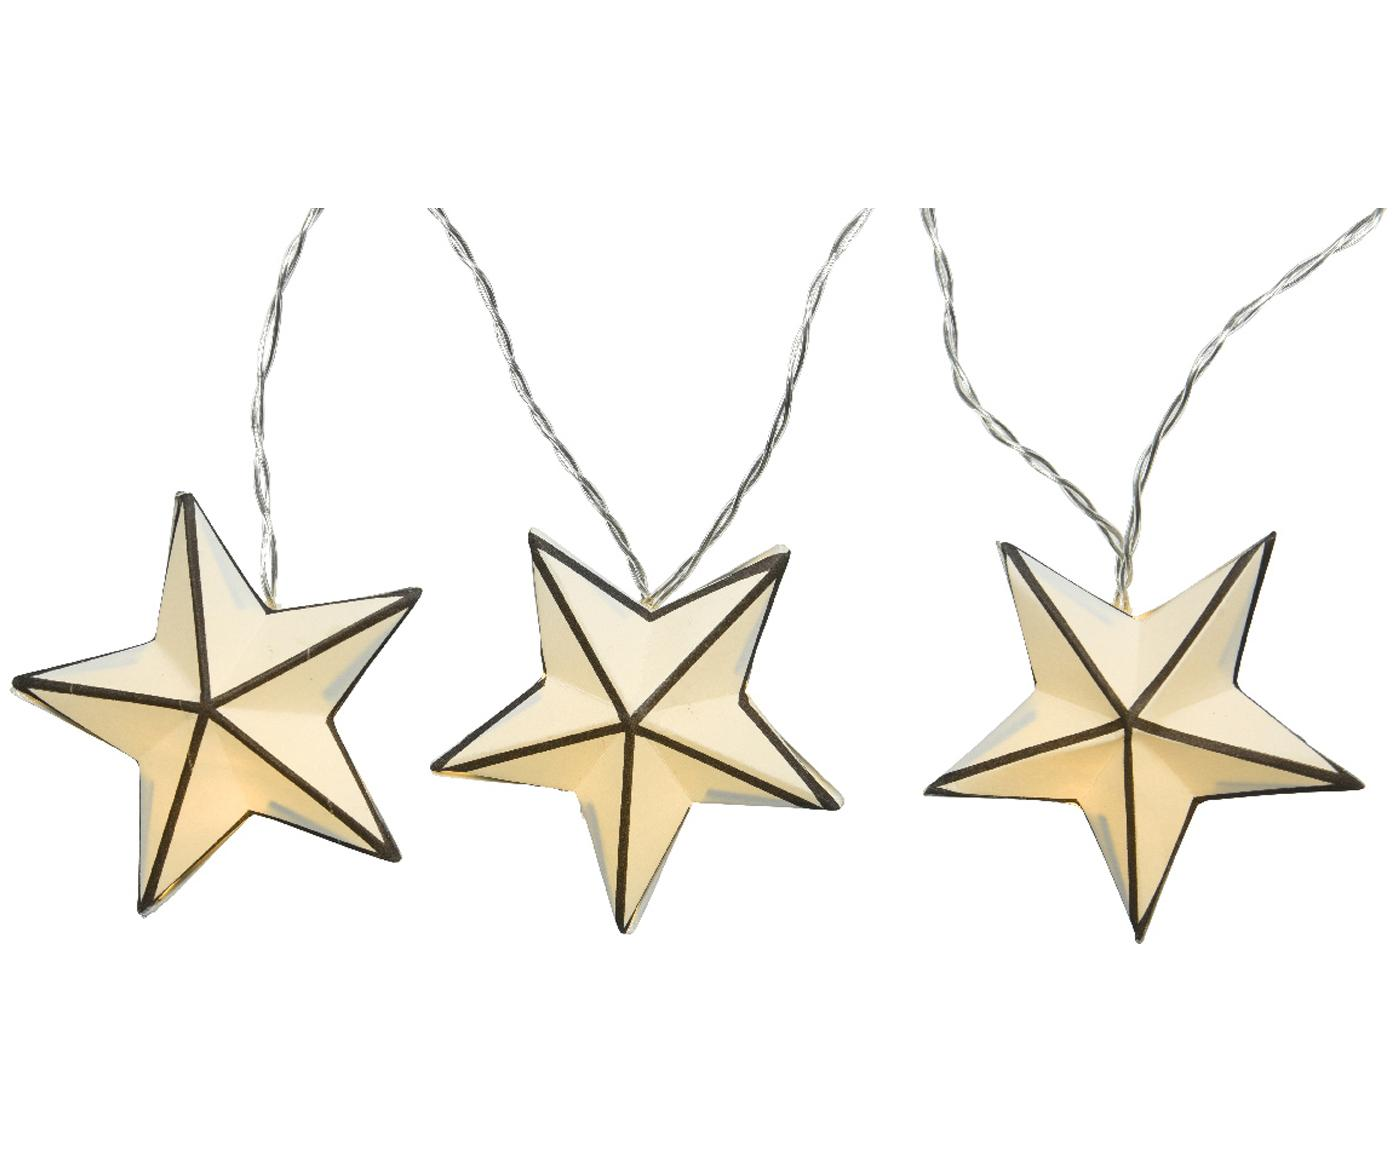 Ghirlanda a LED Stars, Bianco, nero, Lung. 380 cm